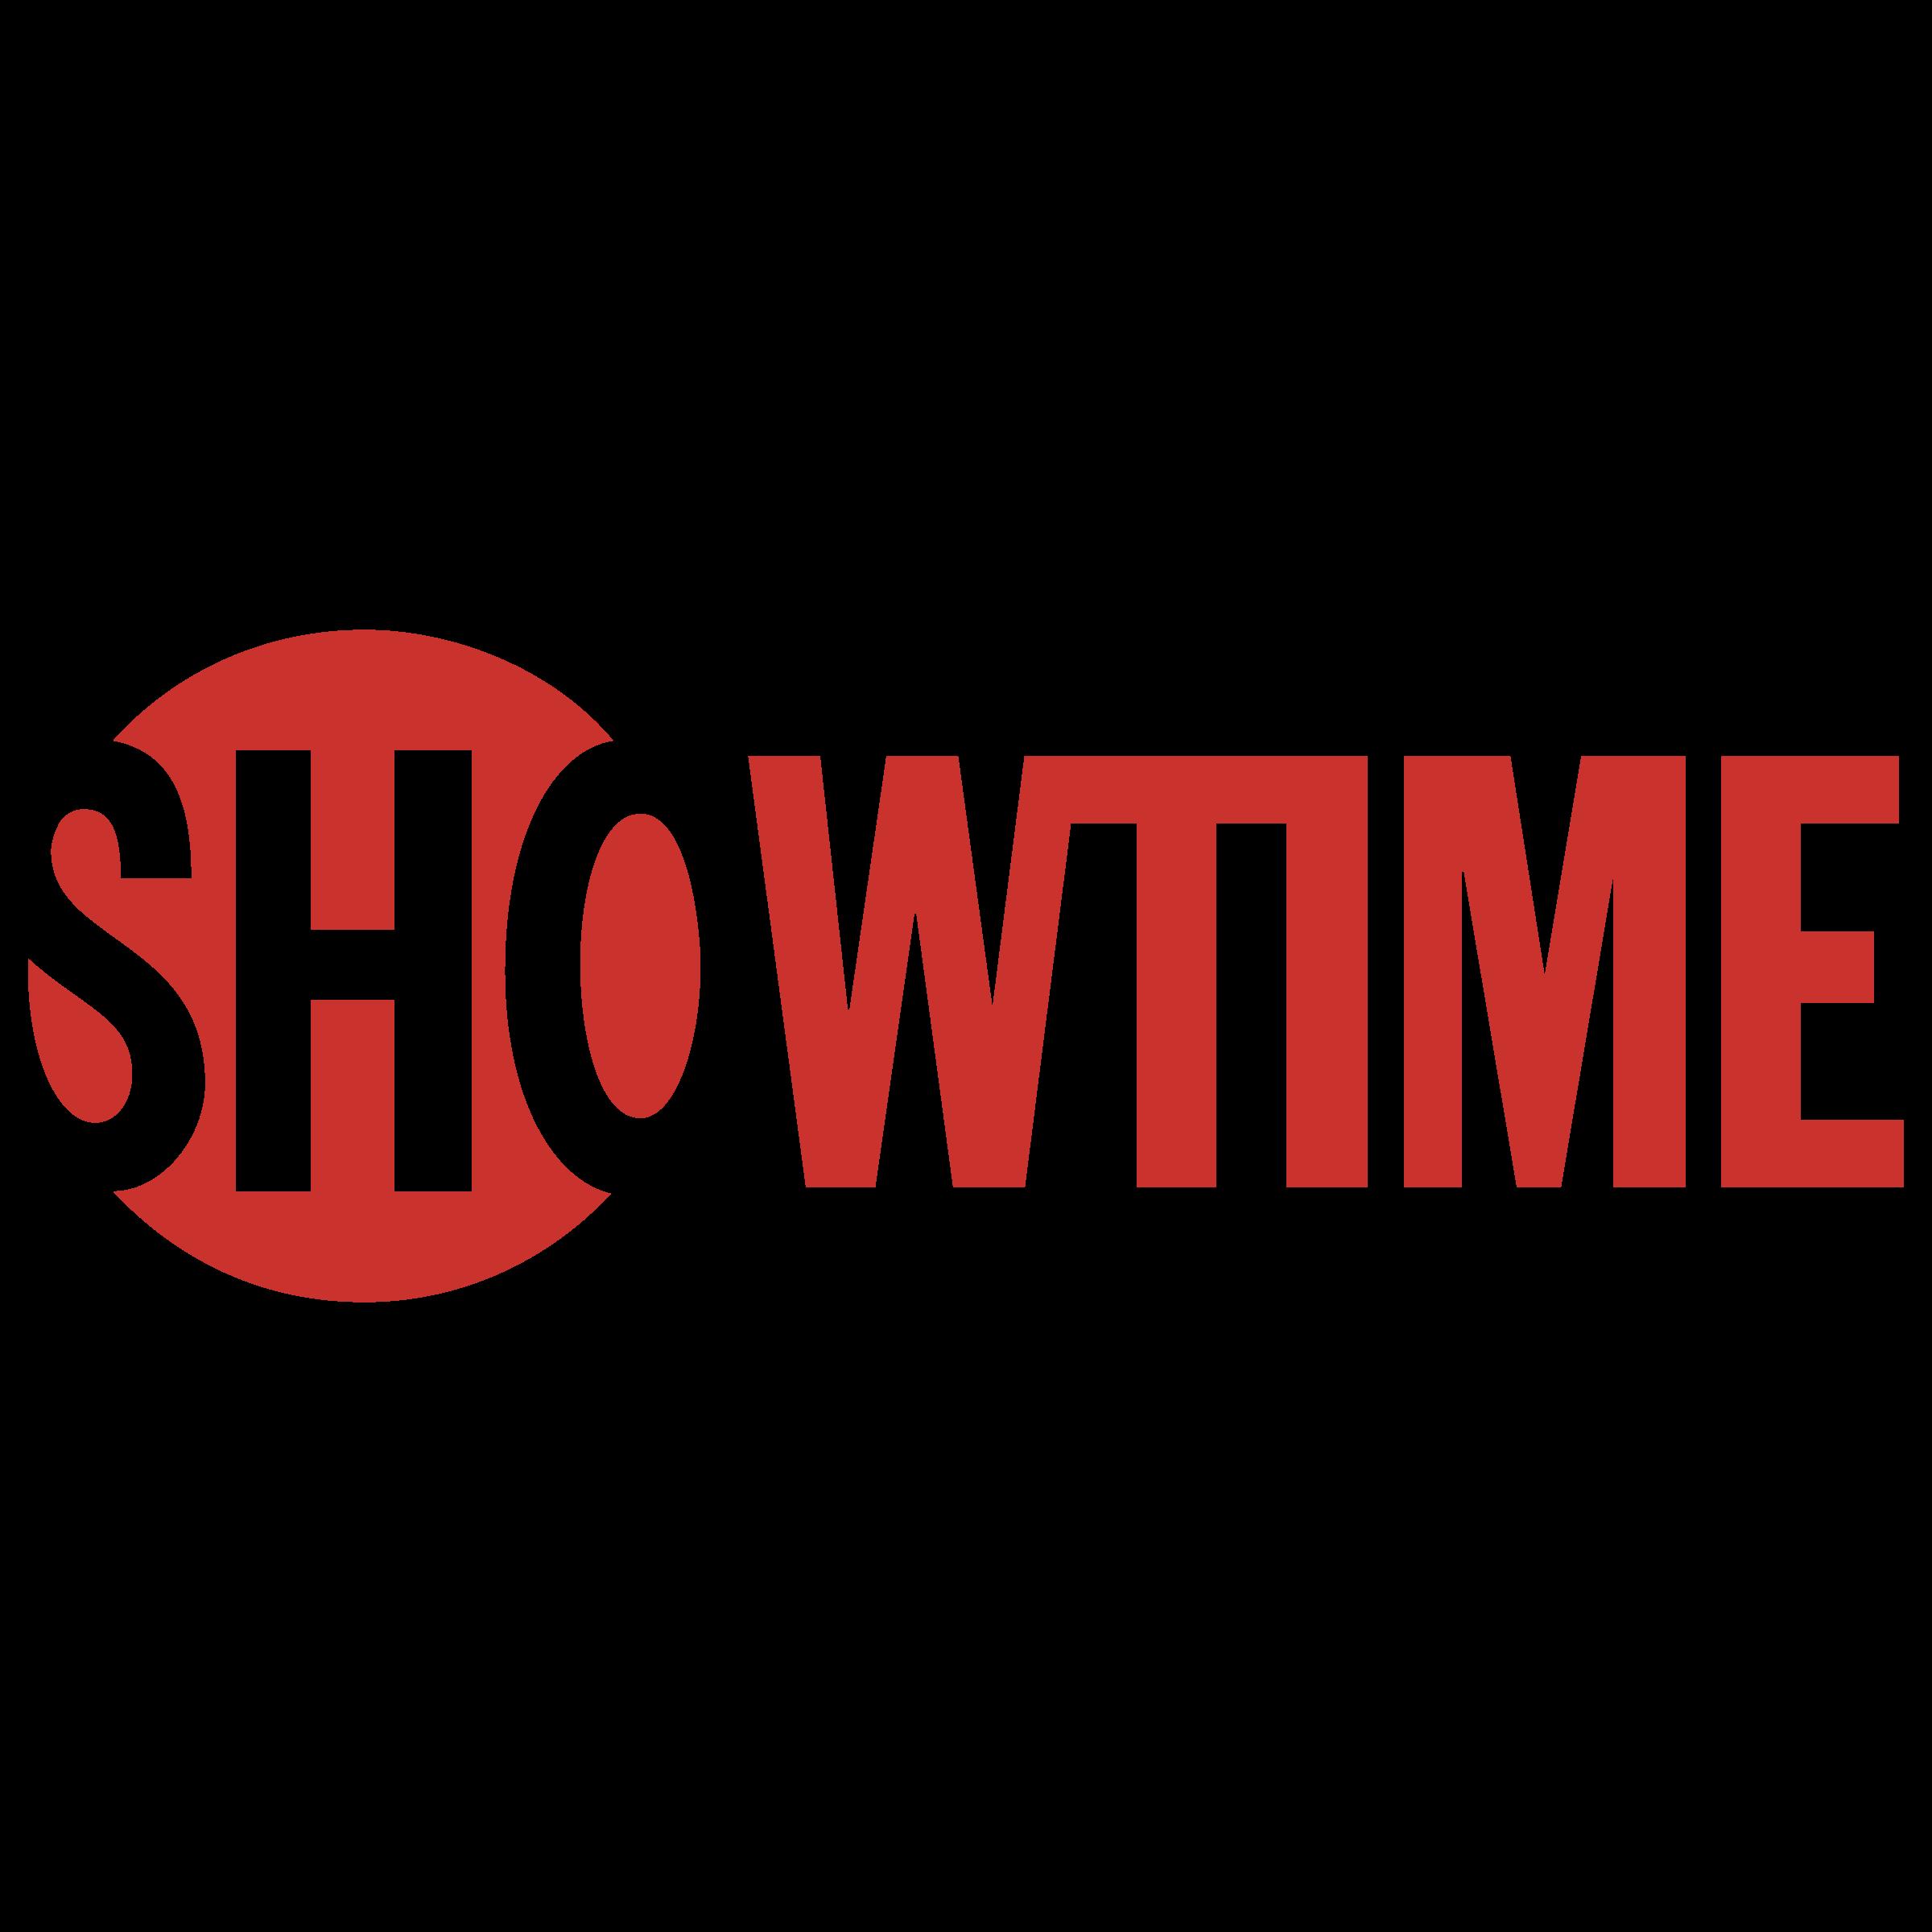 showtime-2-logo-png-transparent